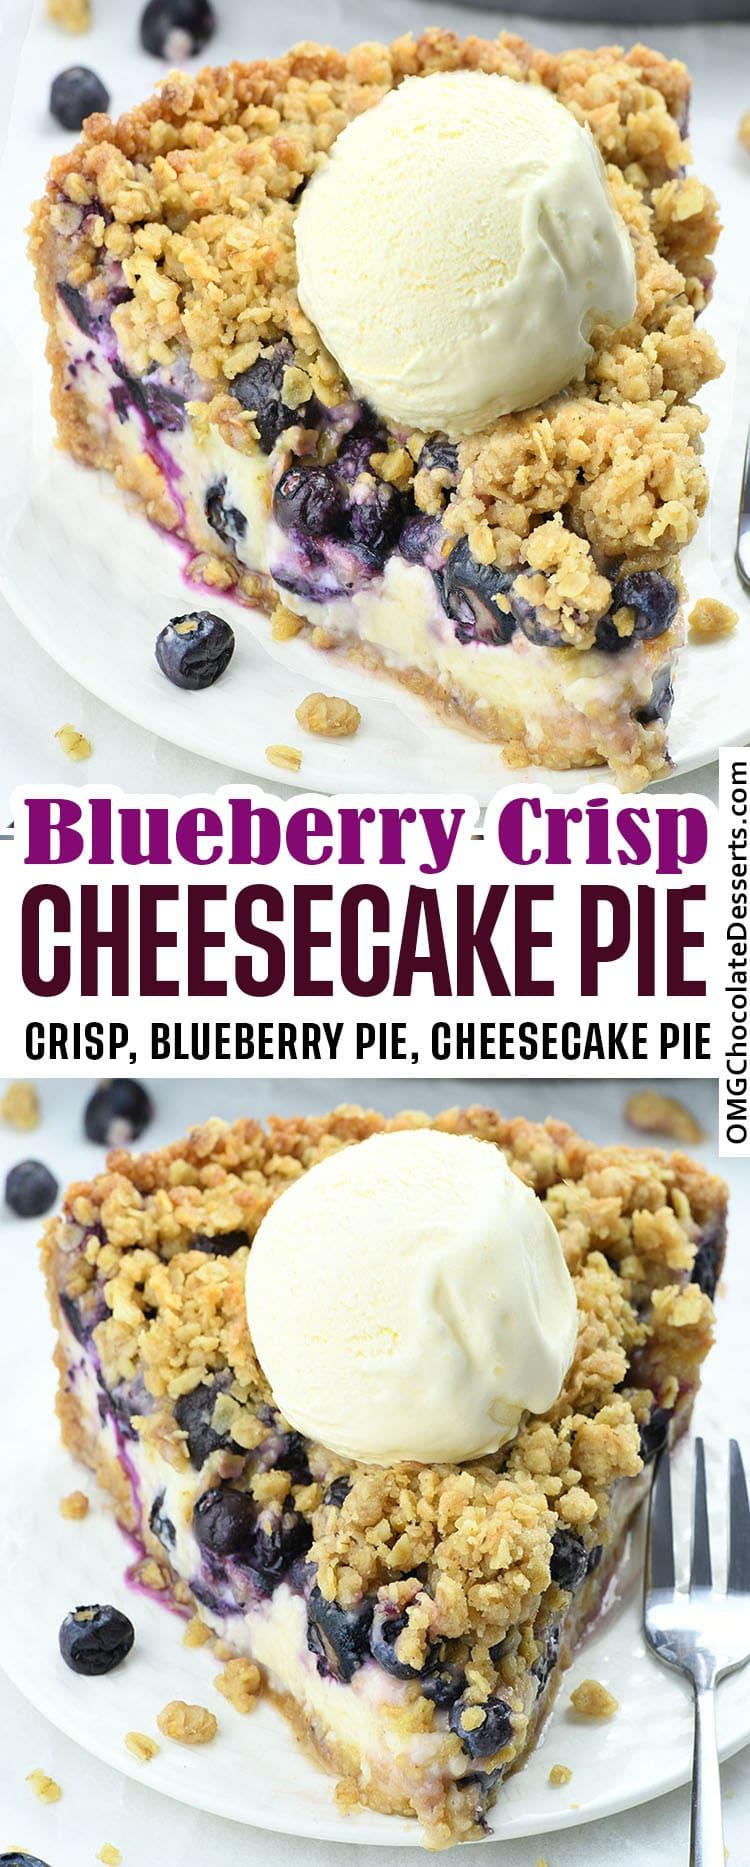 Blueberry Crumble Cheesecake Pie